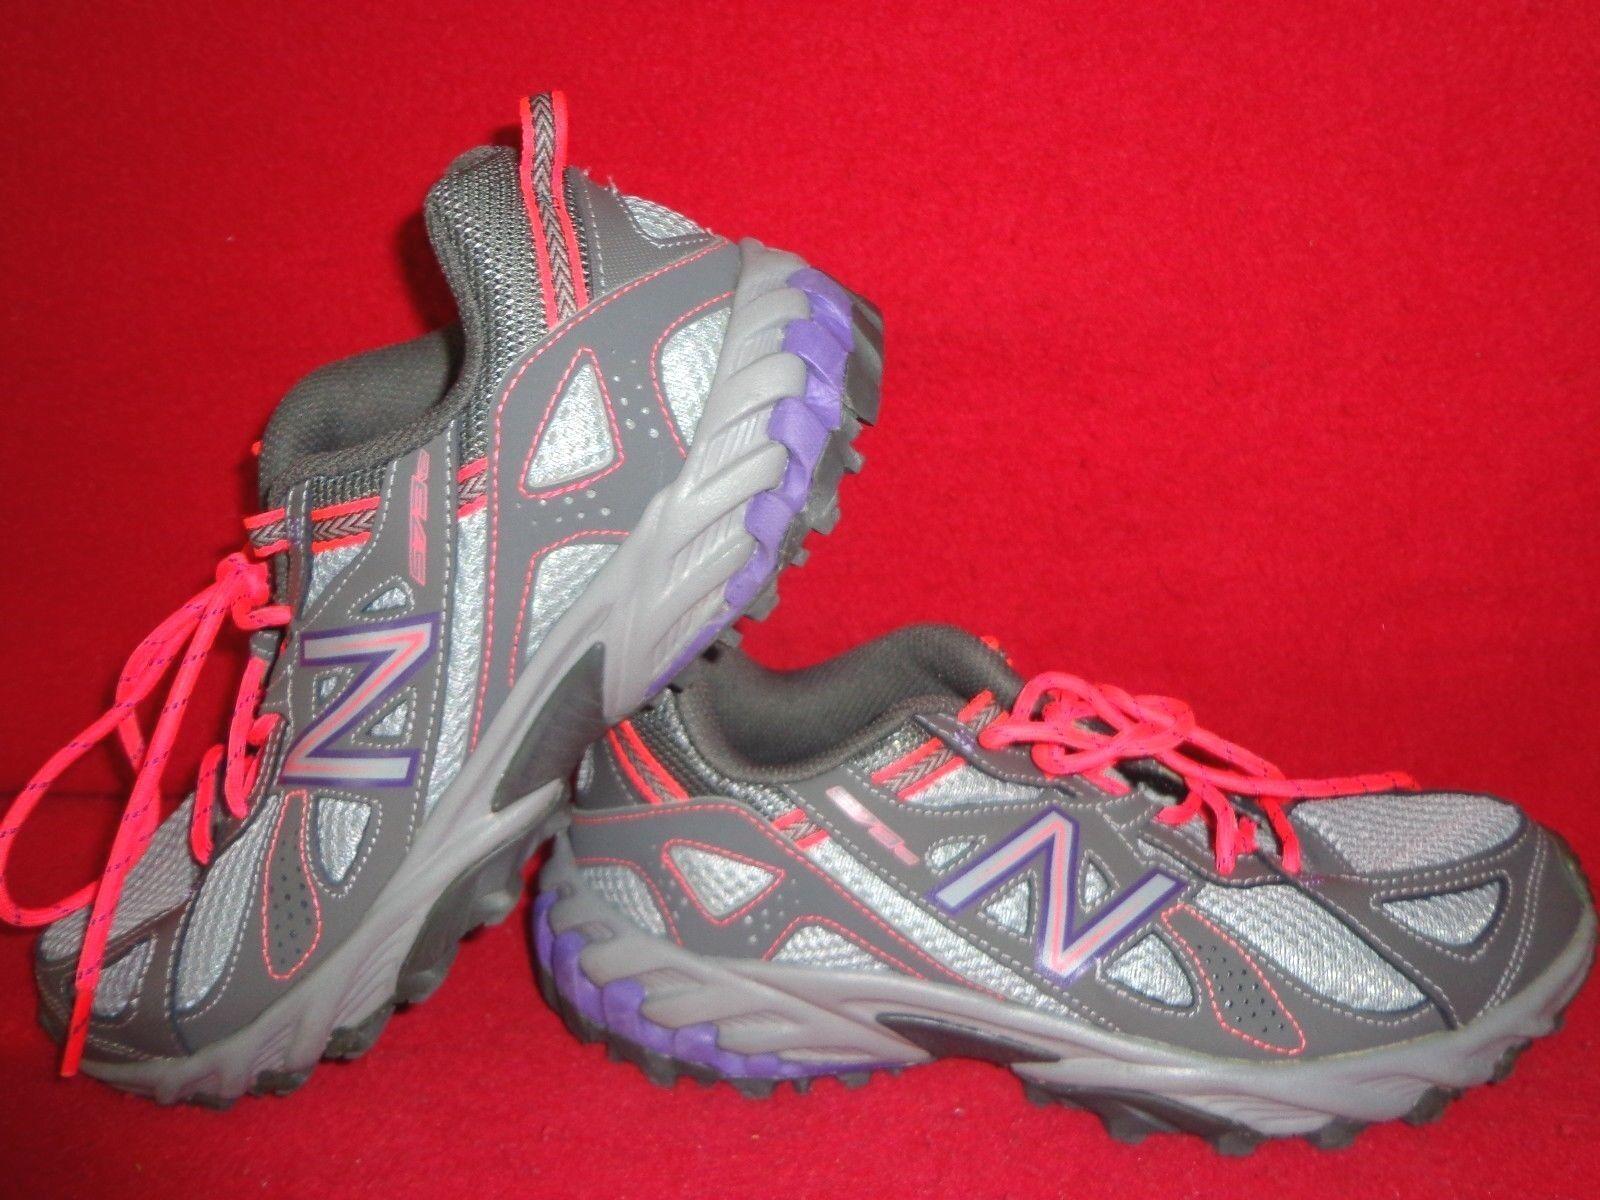 New Balance Trail 573v2 B-(WTE573P2) Athletic Women's shoes Multi-color Size 9